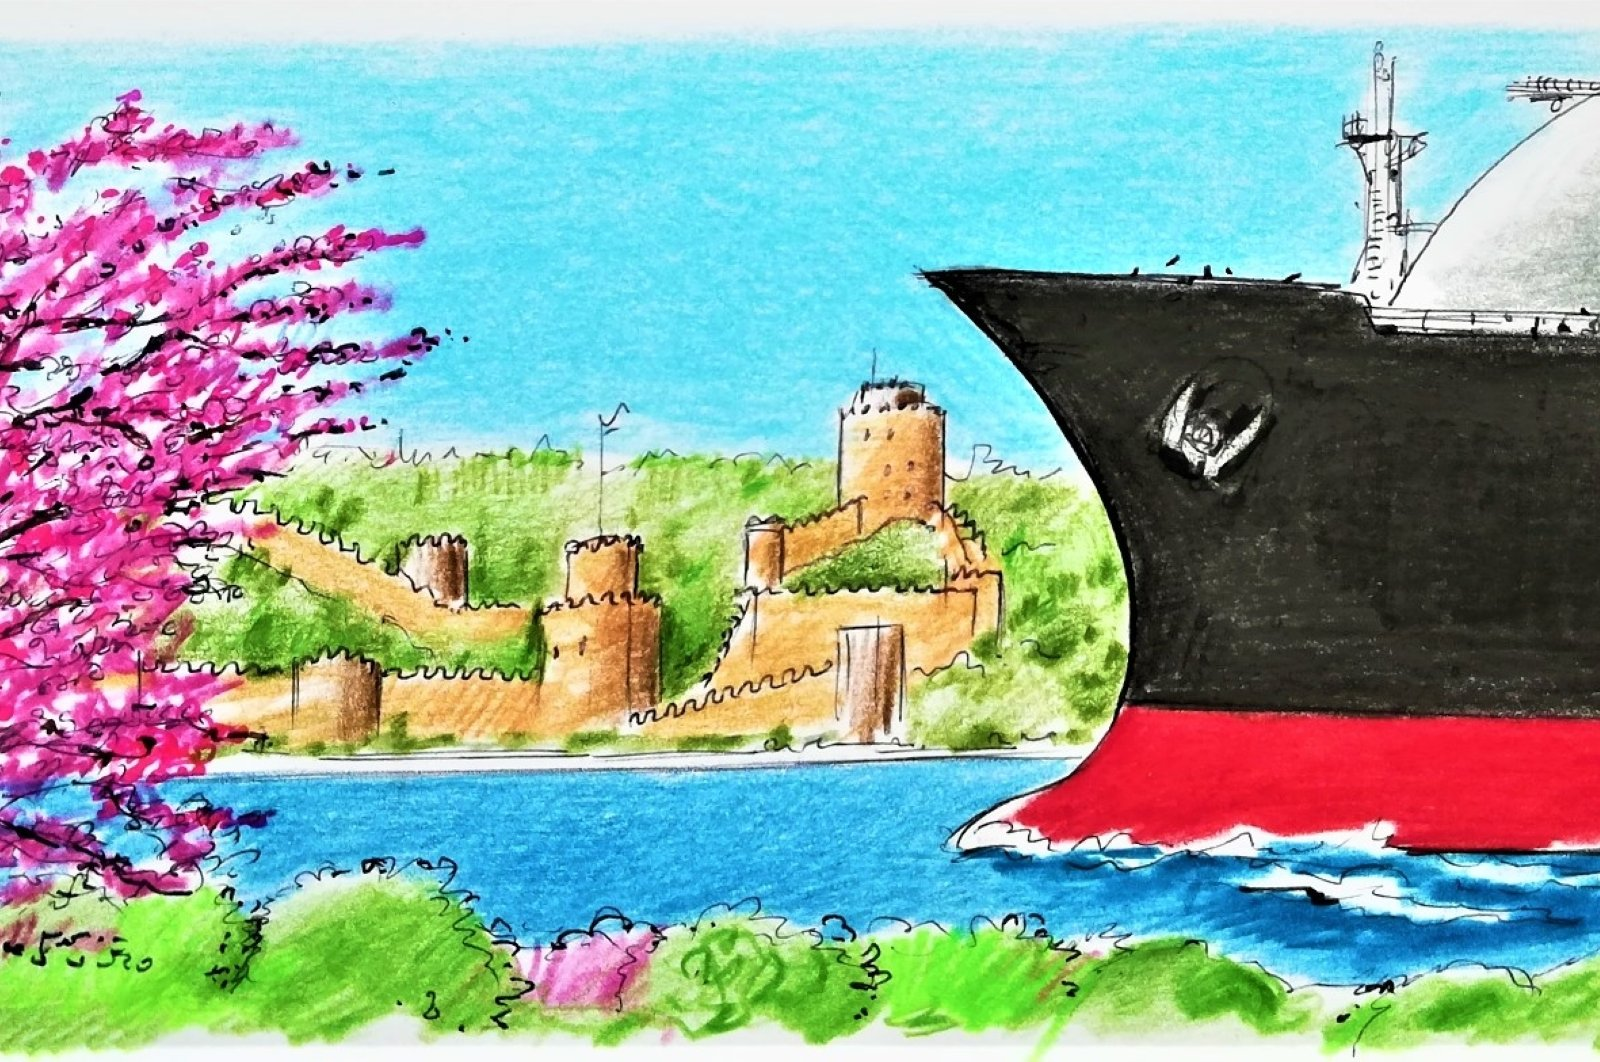 Illustration by Erhan Yalvaç shows a ship passing through the Bosporus as Rumeli Hisarı, an Ottoman-era fortress, is seen background on the European side of Turkey's metropolis Istanbul.